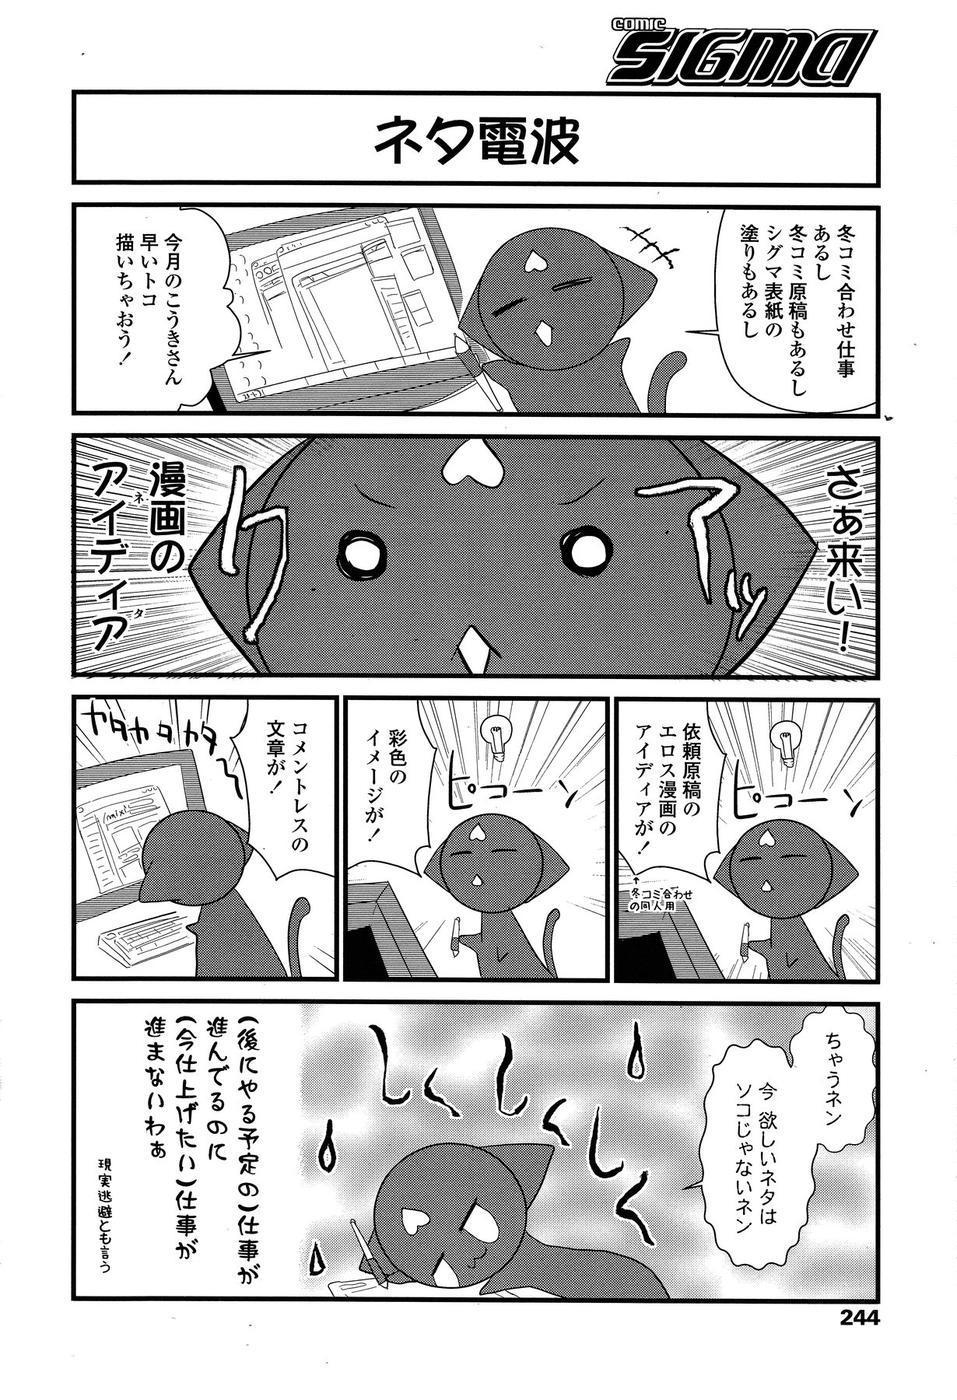 COMIC SIGMA 2009-01 Vol.28 148